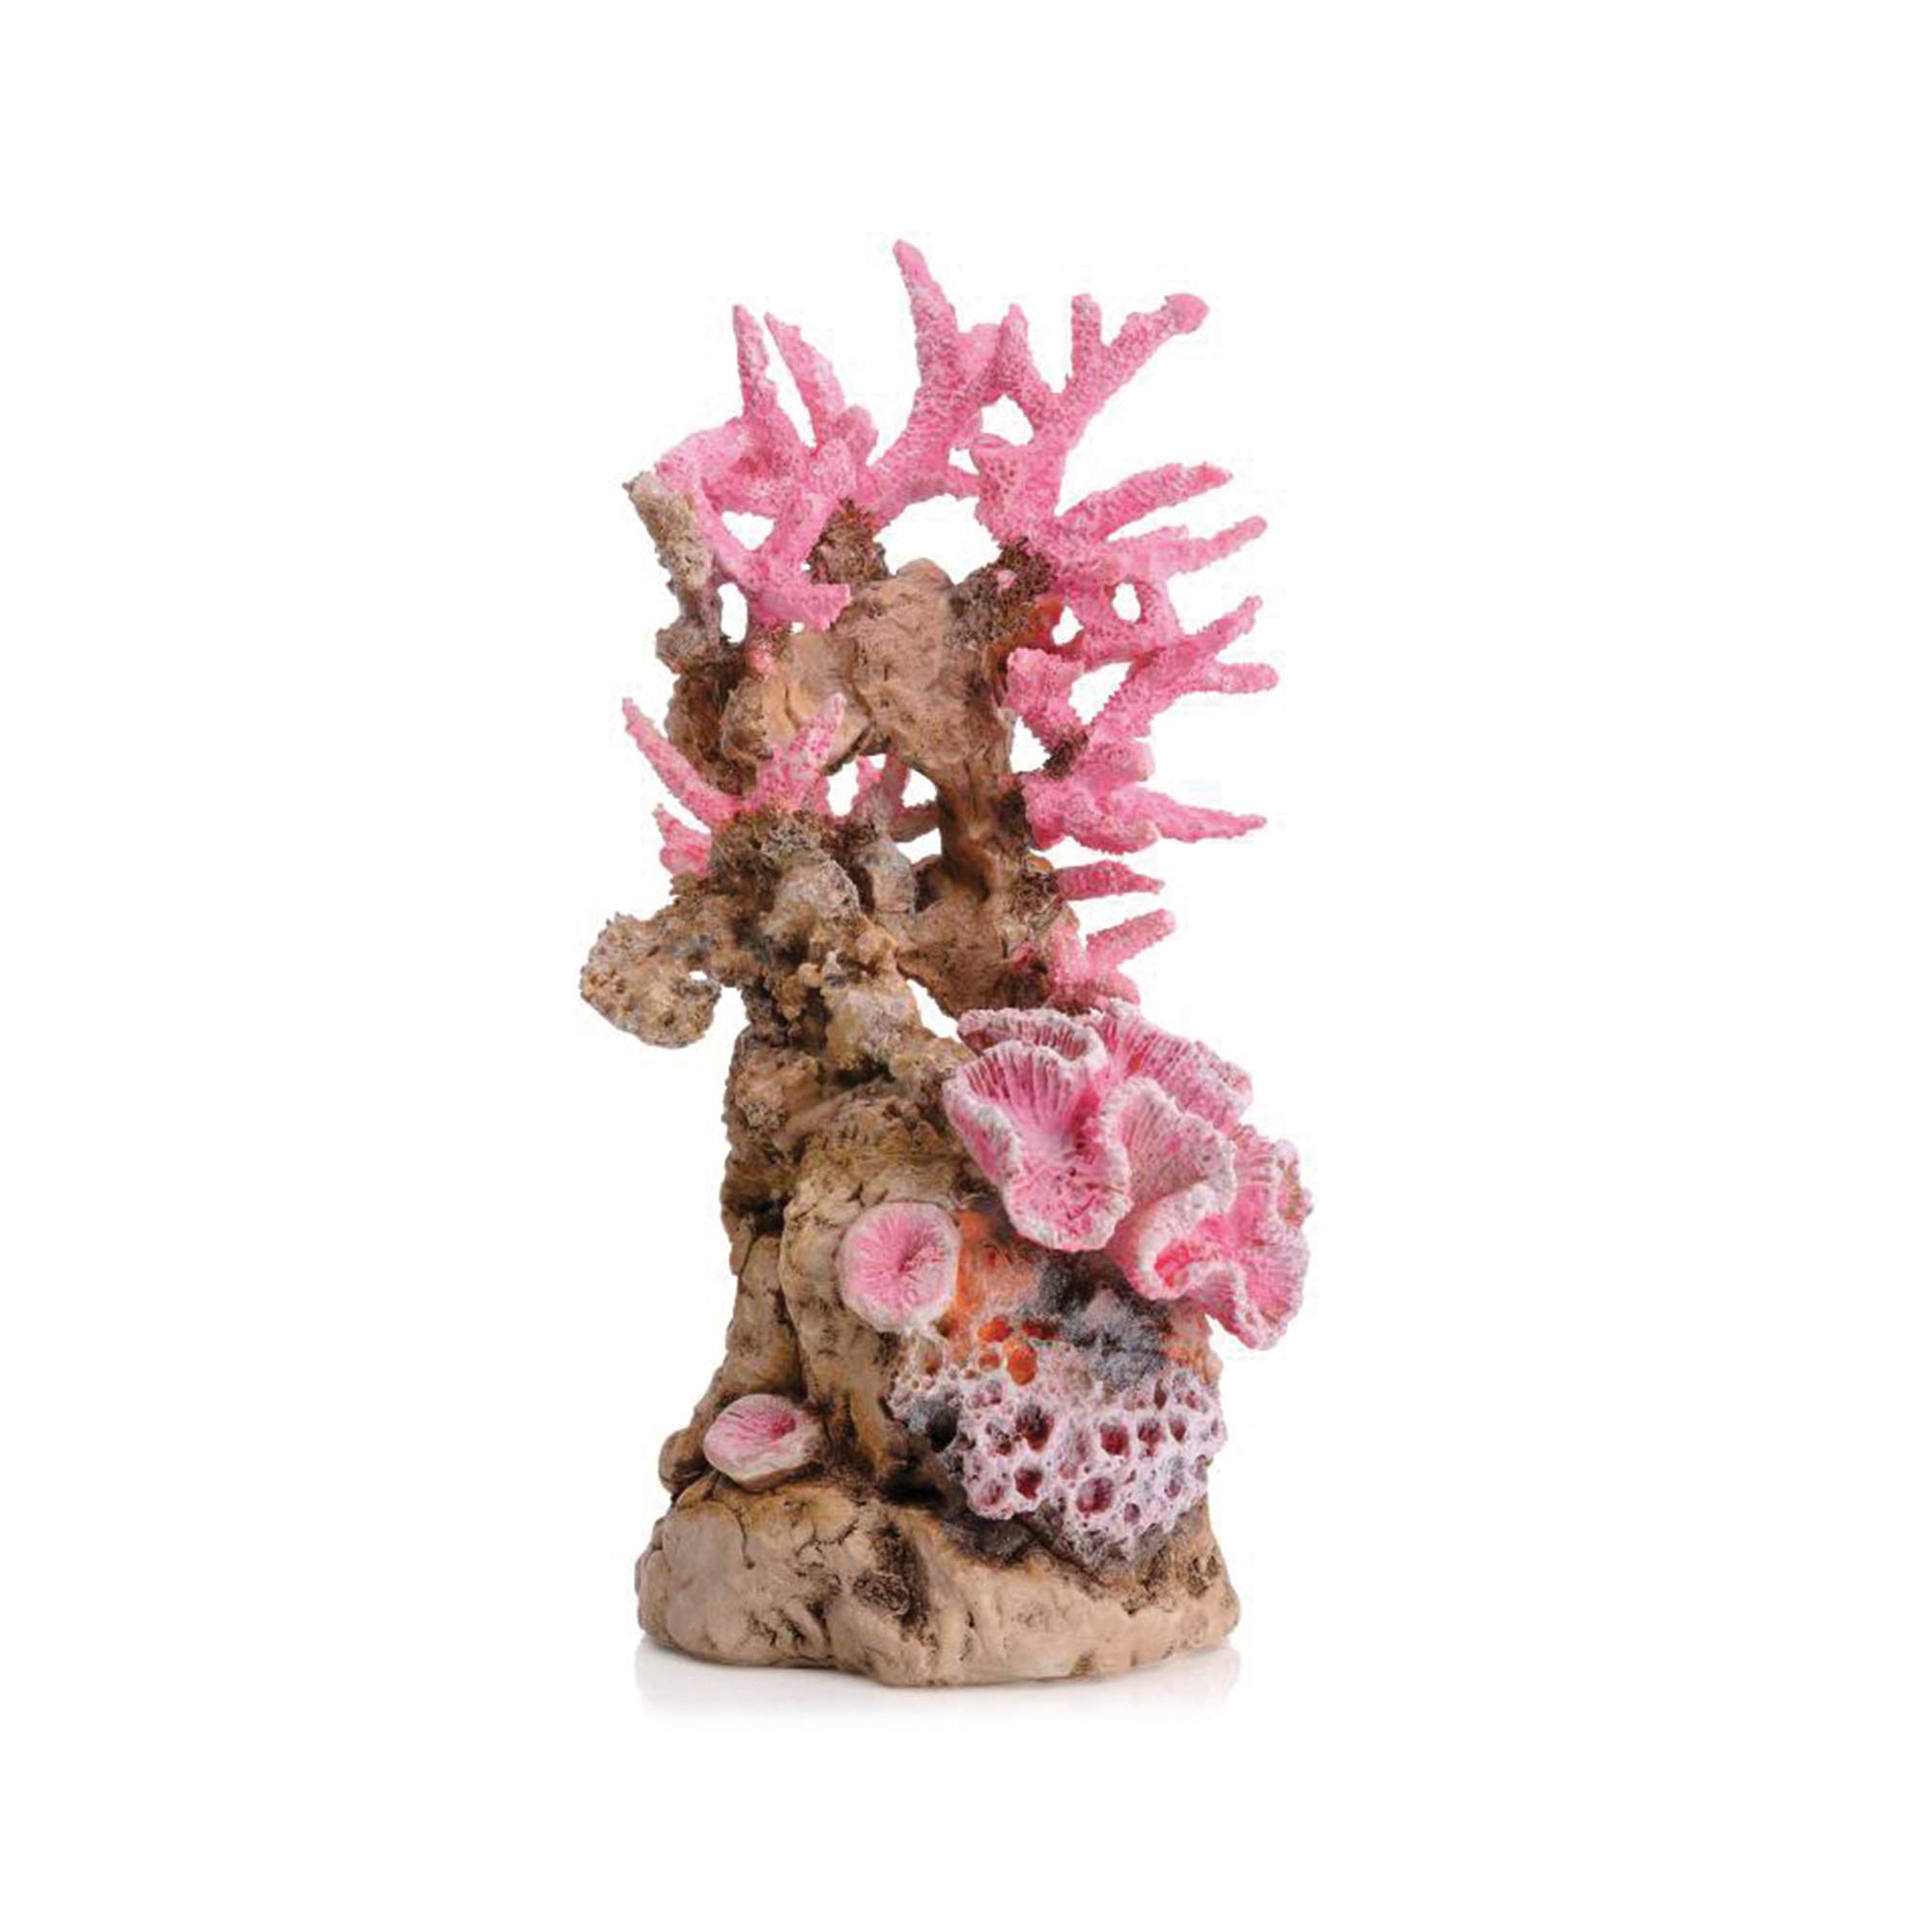 biOrb 46130.0 Reef Ornament Pink Aquariums